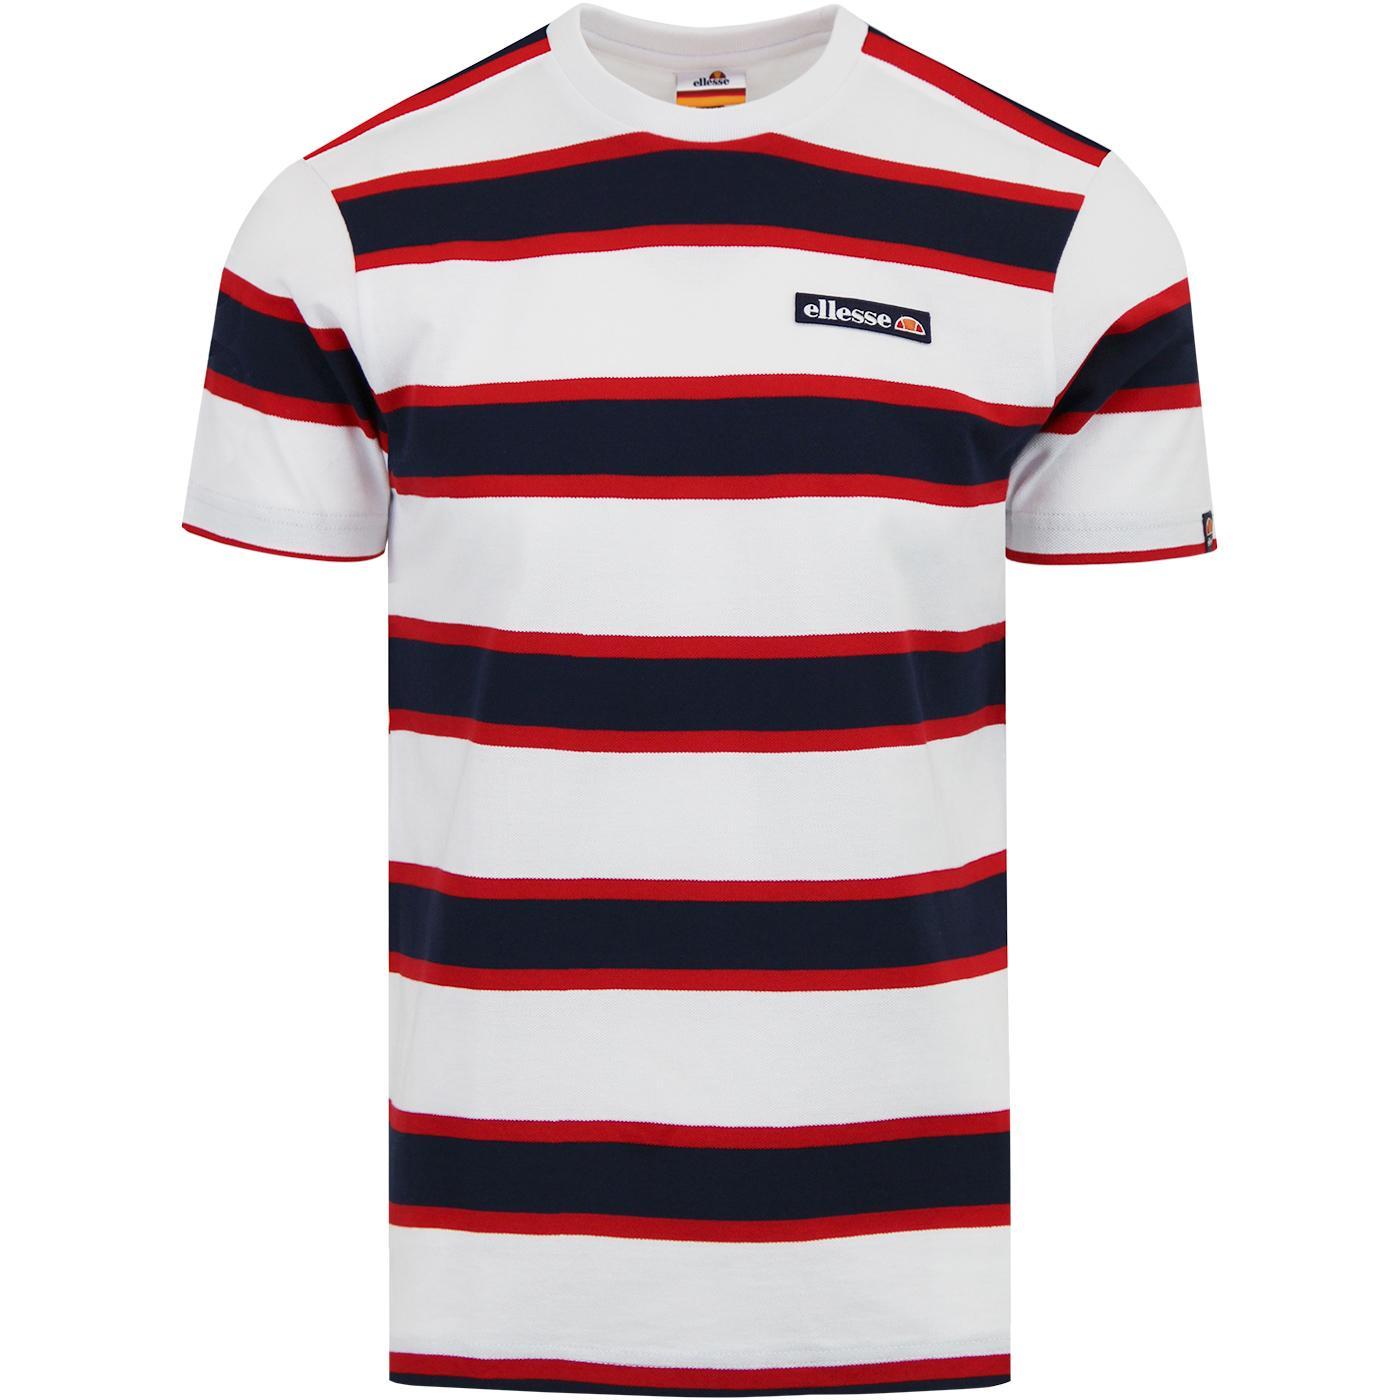 Pluto ELLESSE Retro Bold Stripe Pique T-Shirt W